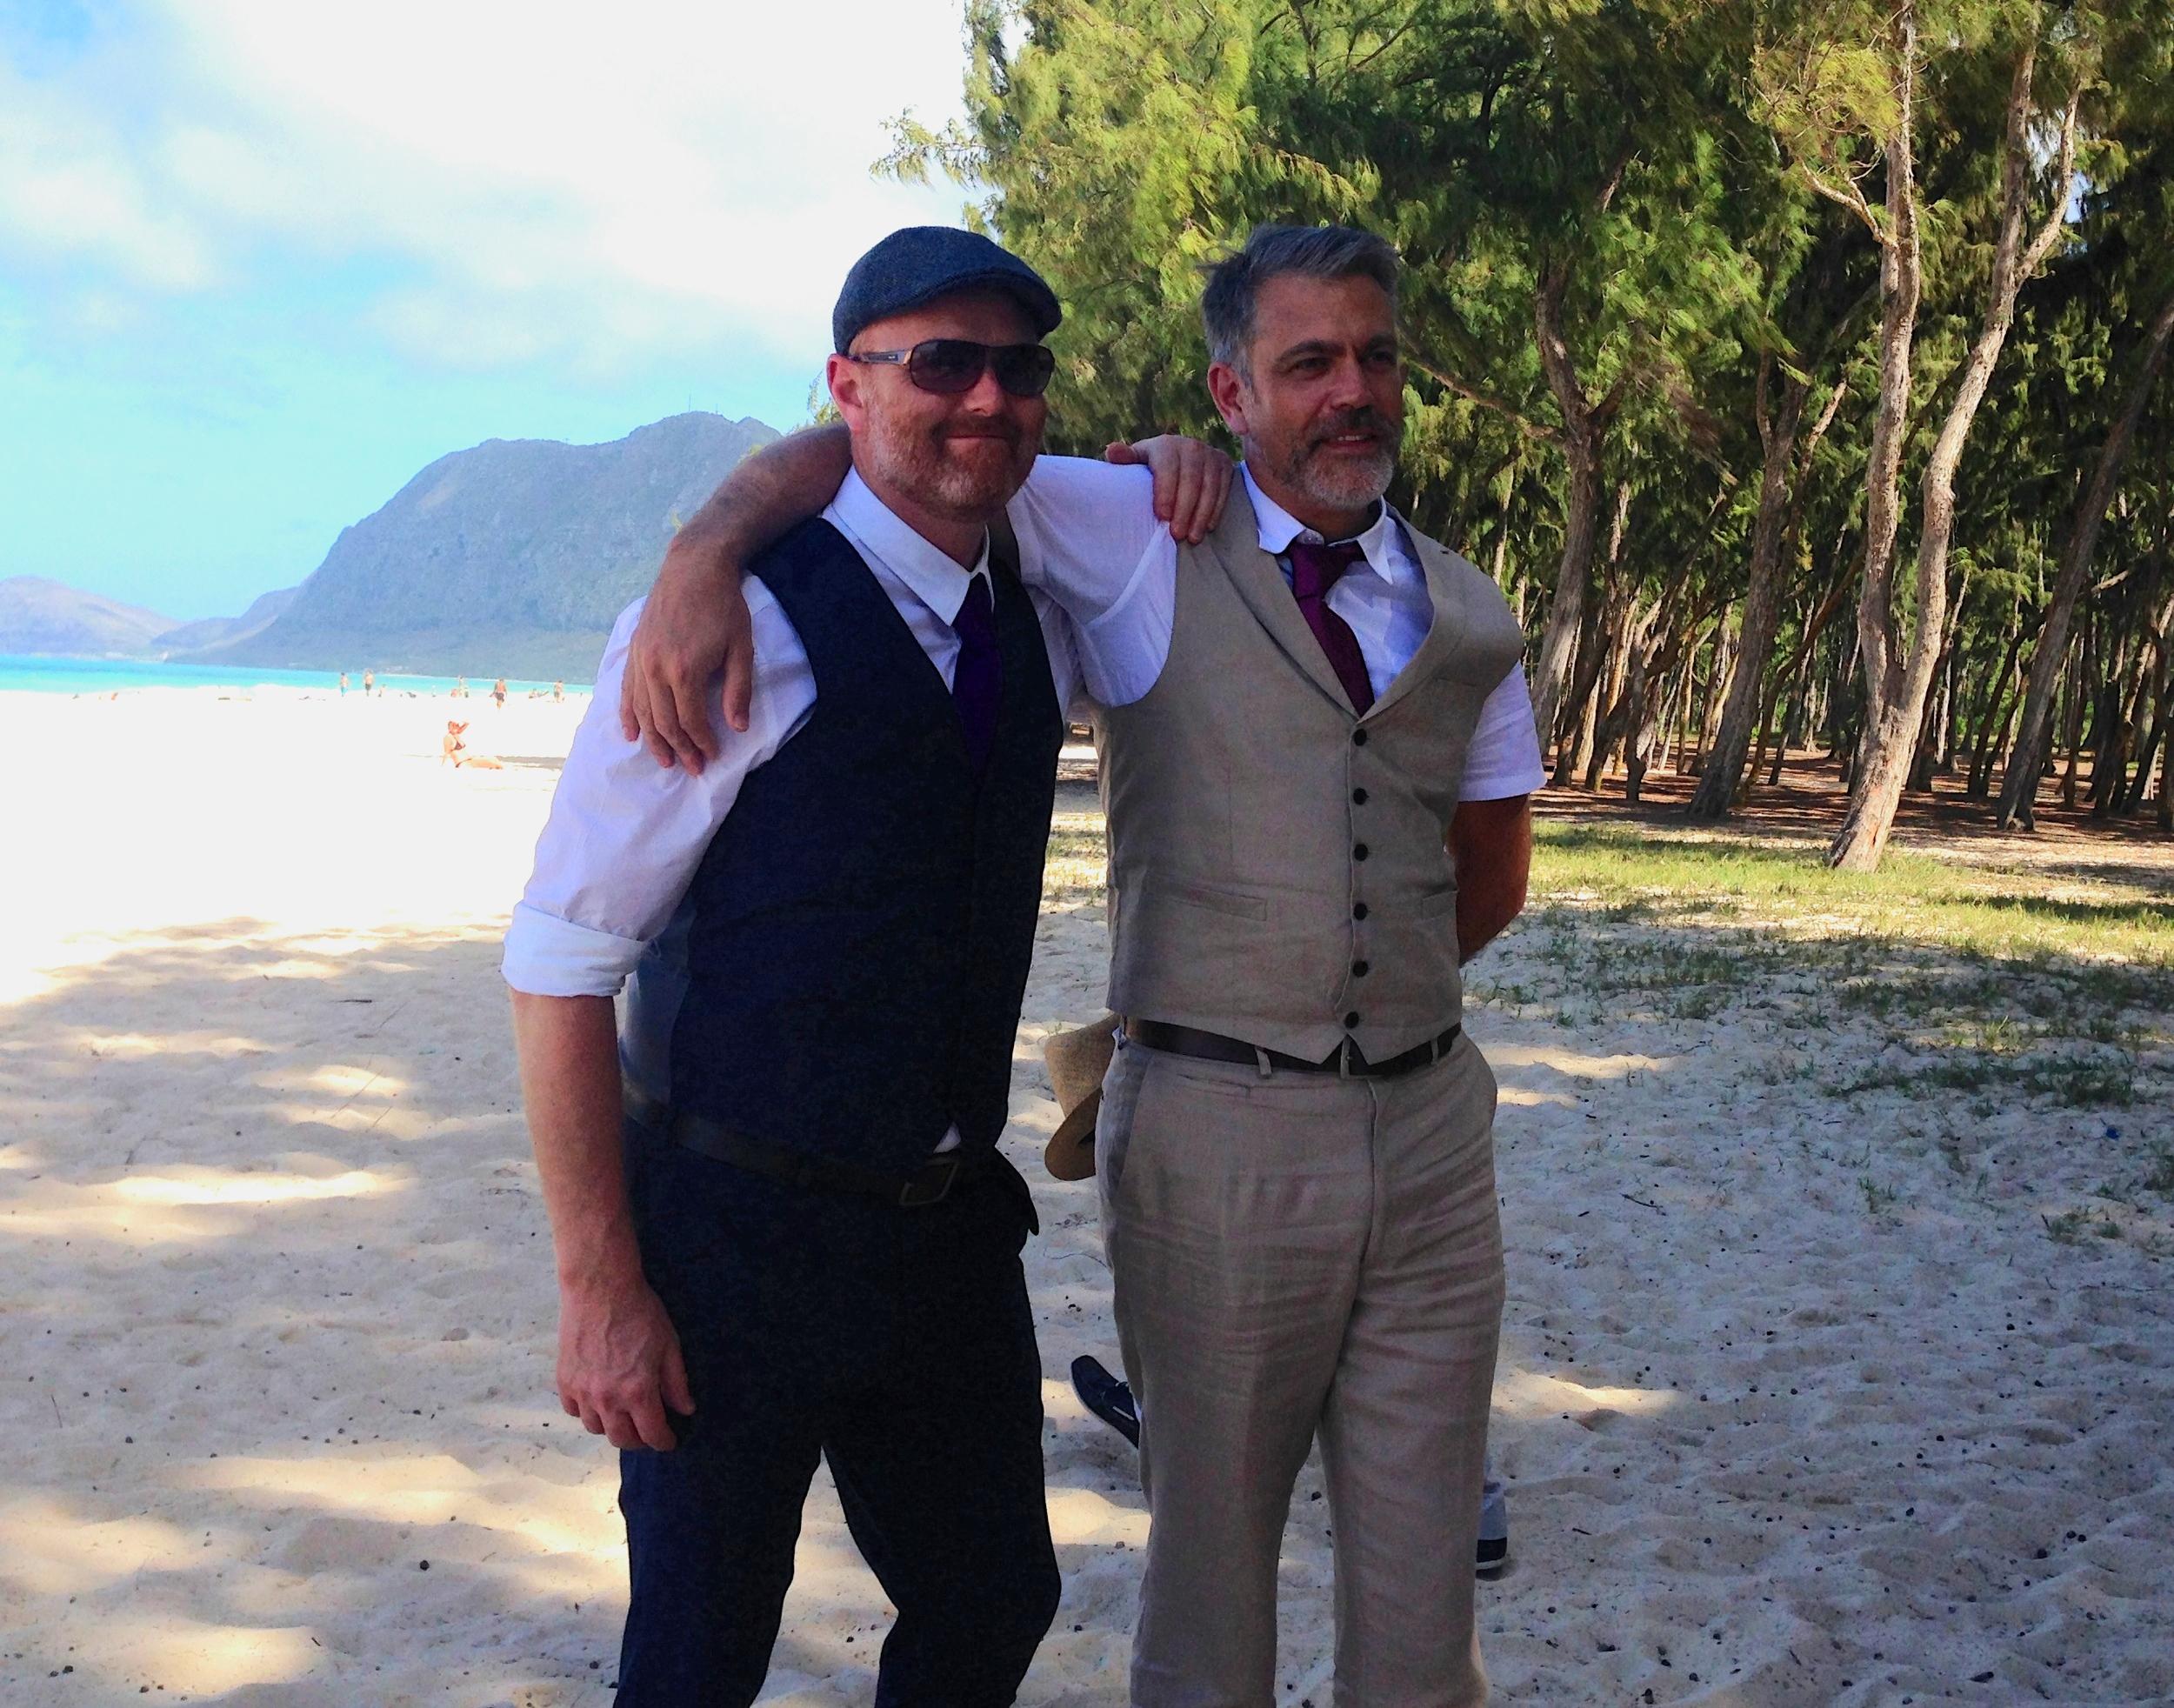 oahu-beach-wedding-4.jpg